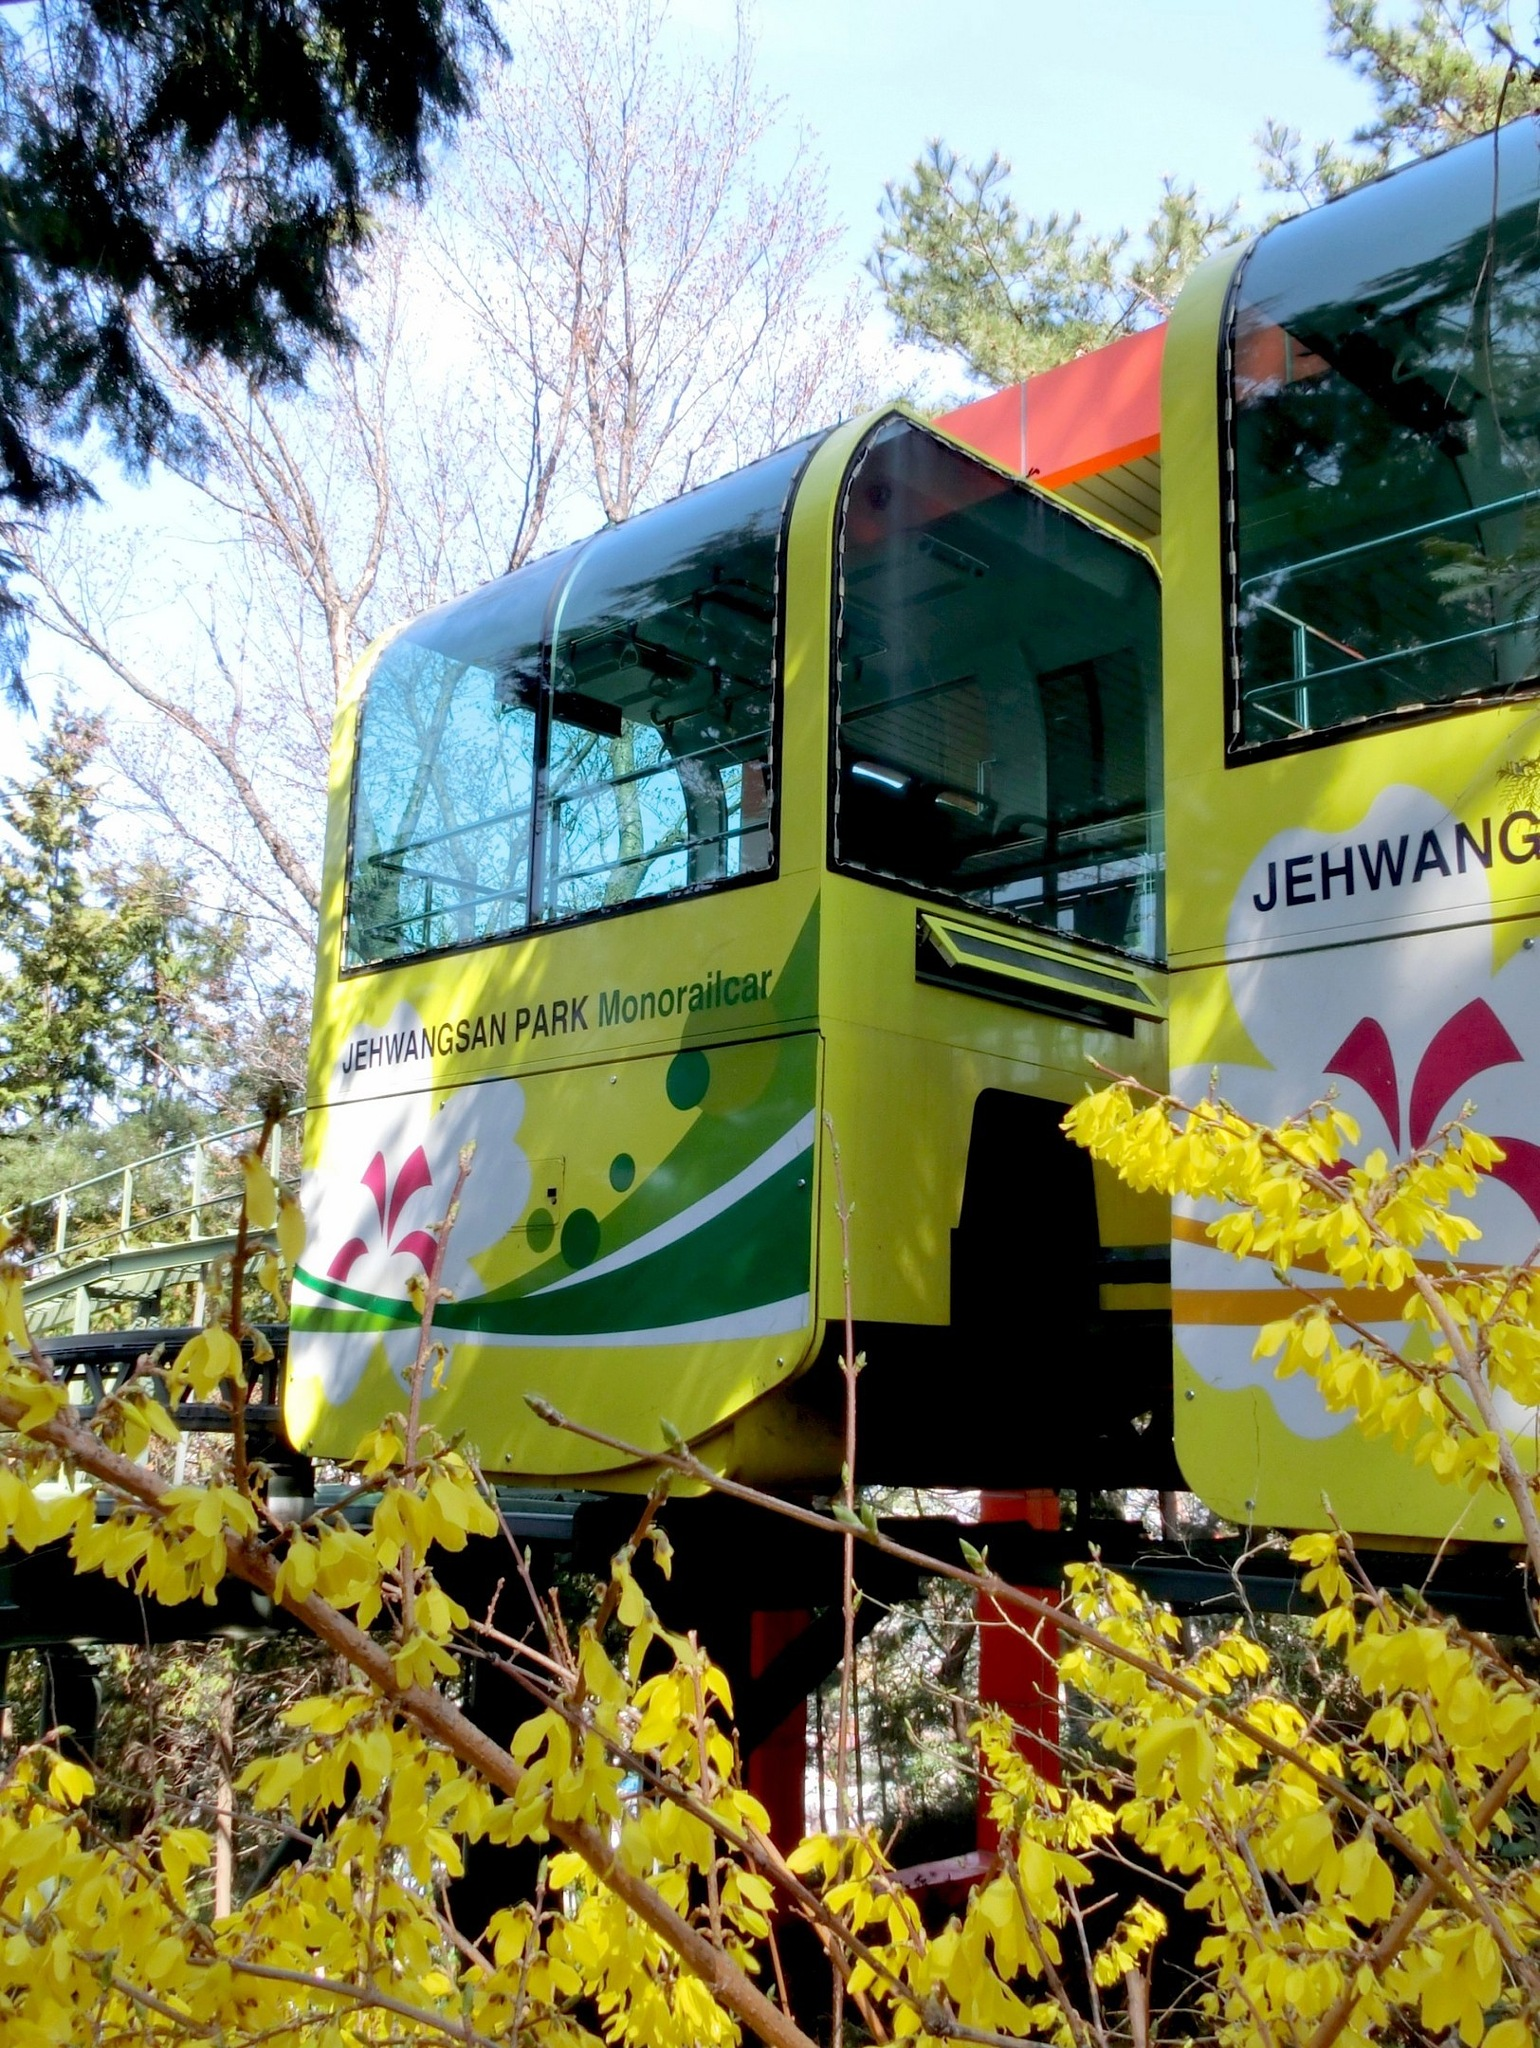 Jehwangsan cable car-2 by pop88123